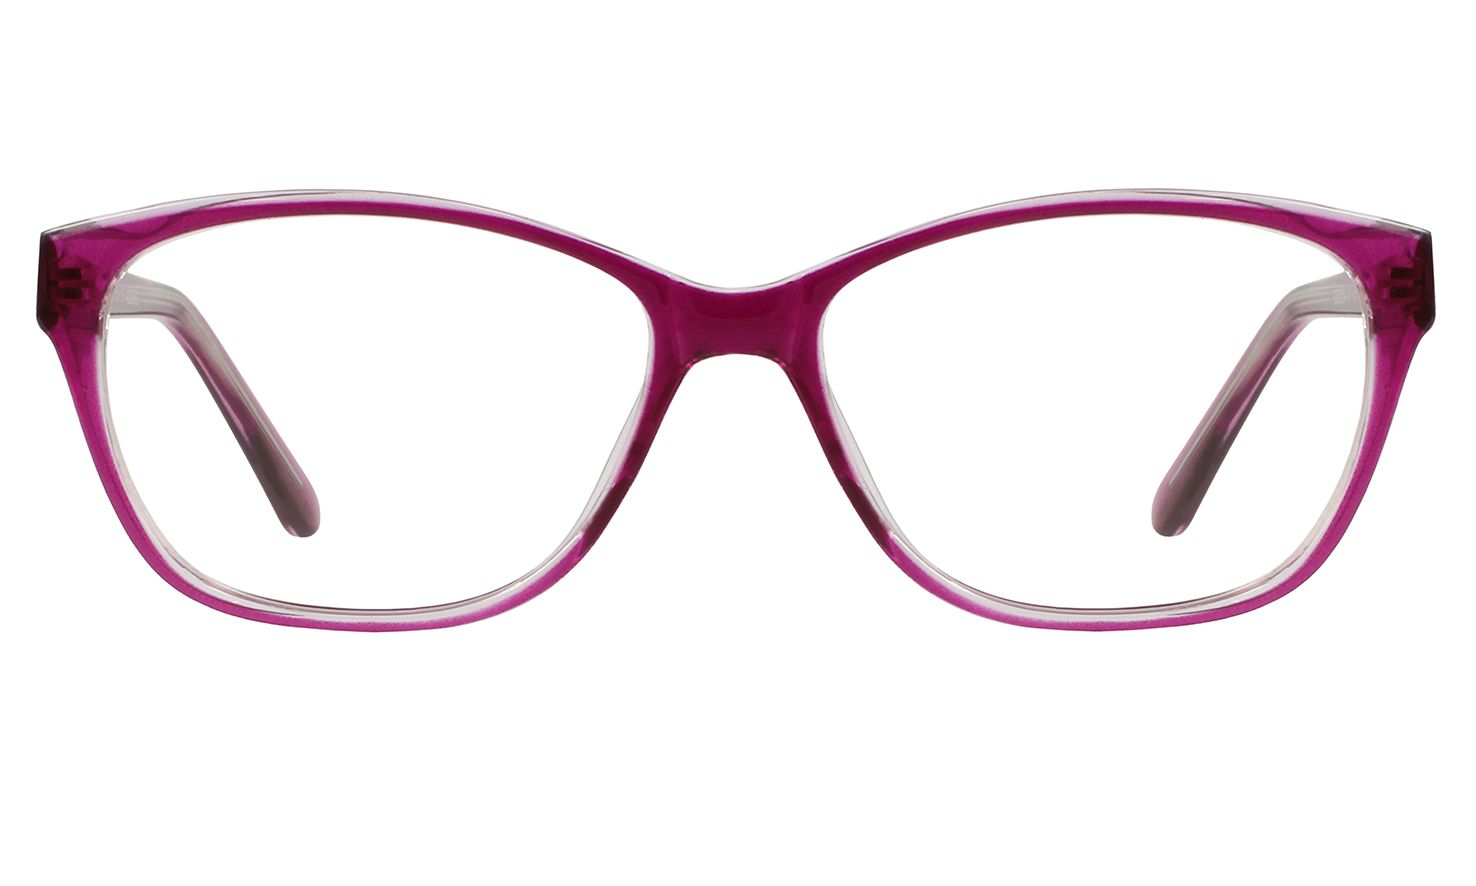 ac69ede63304 Brink Couture Suzette Prescription Glasses